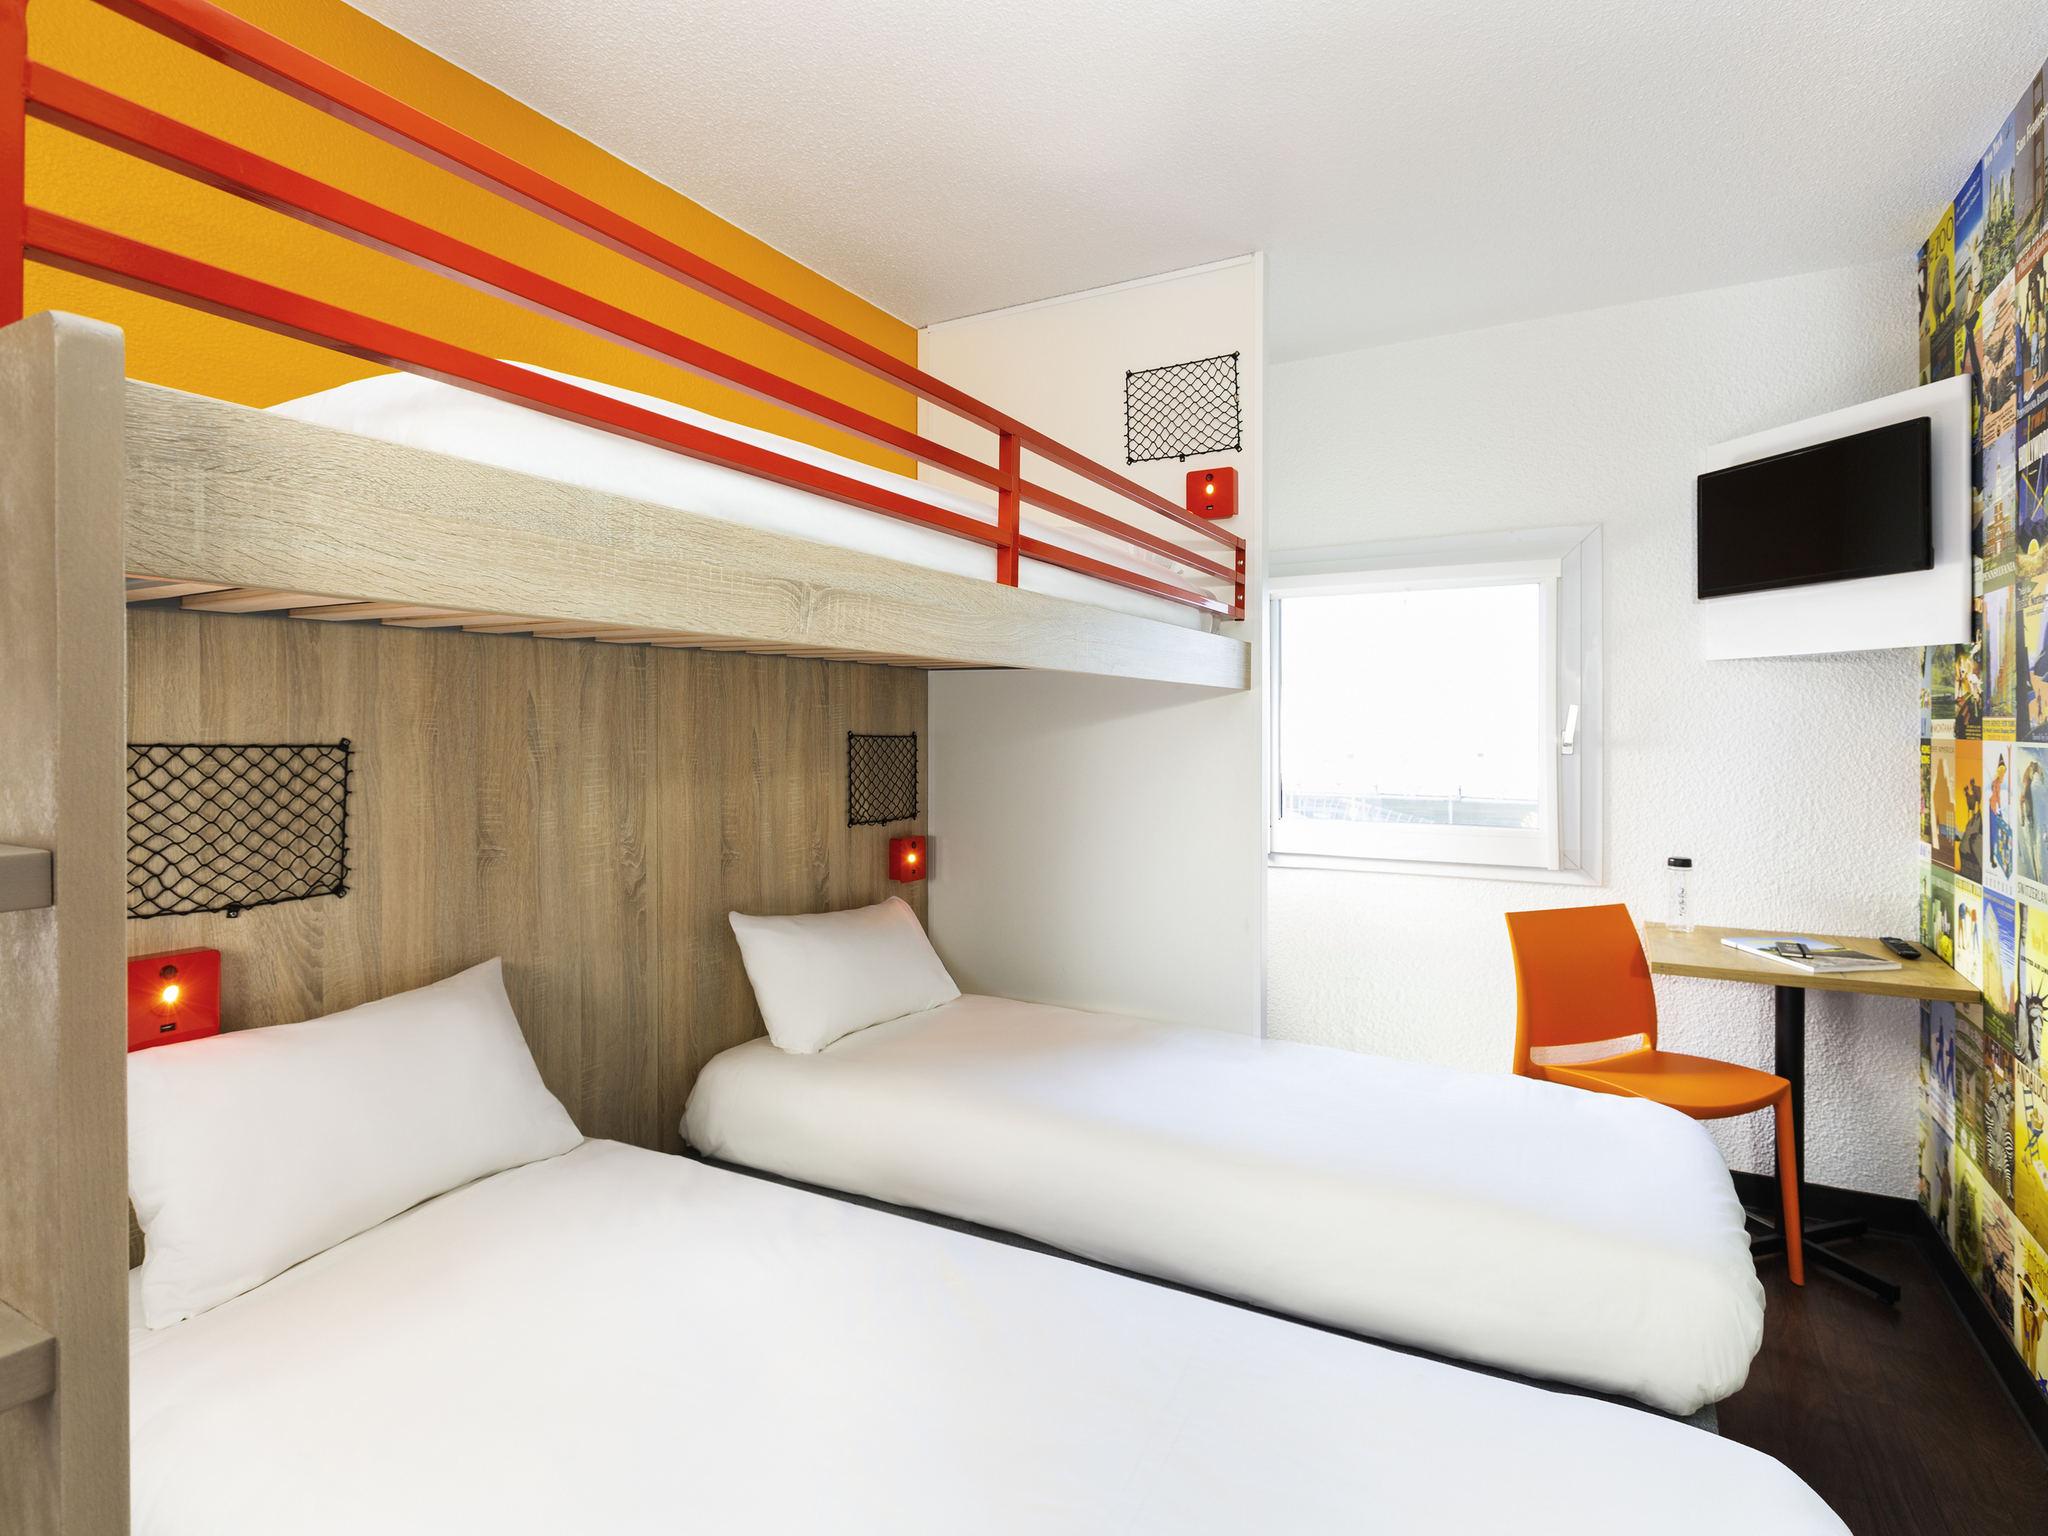 Отель — hotelF1 Avignon Nord